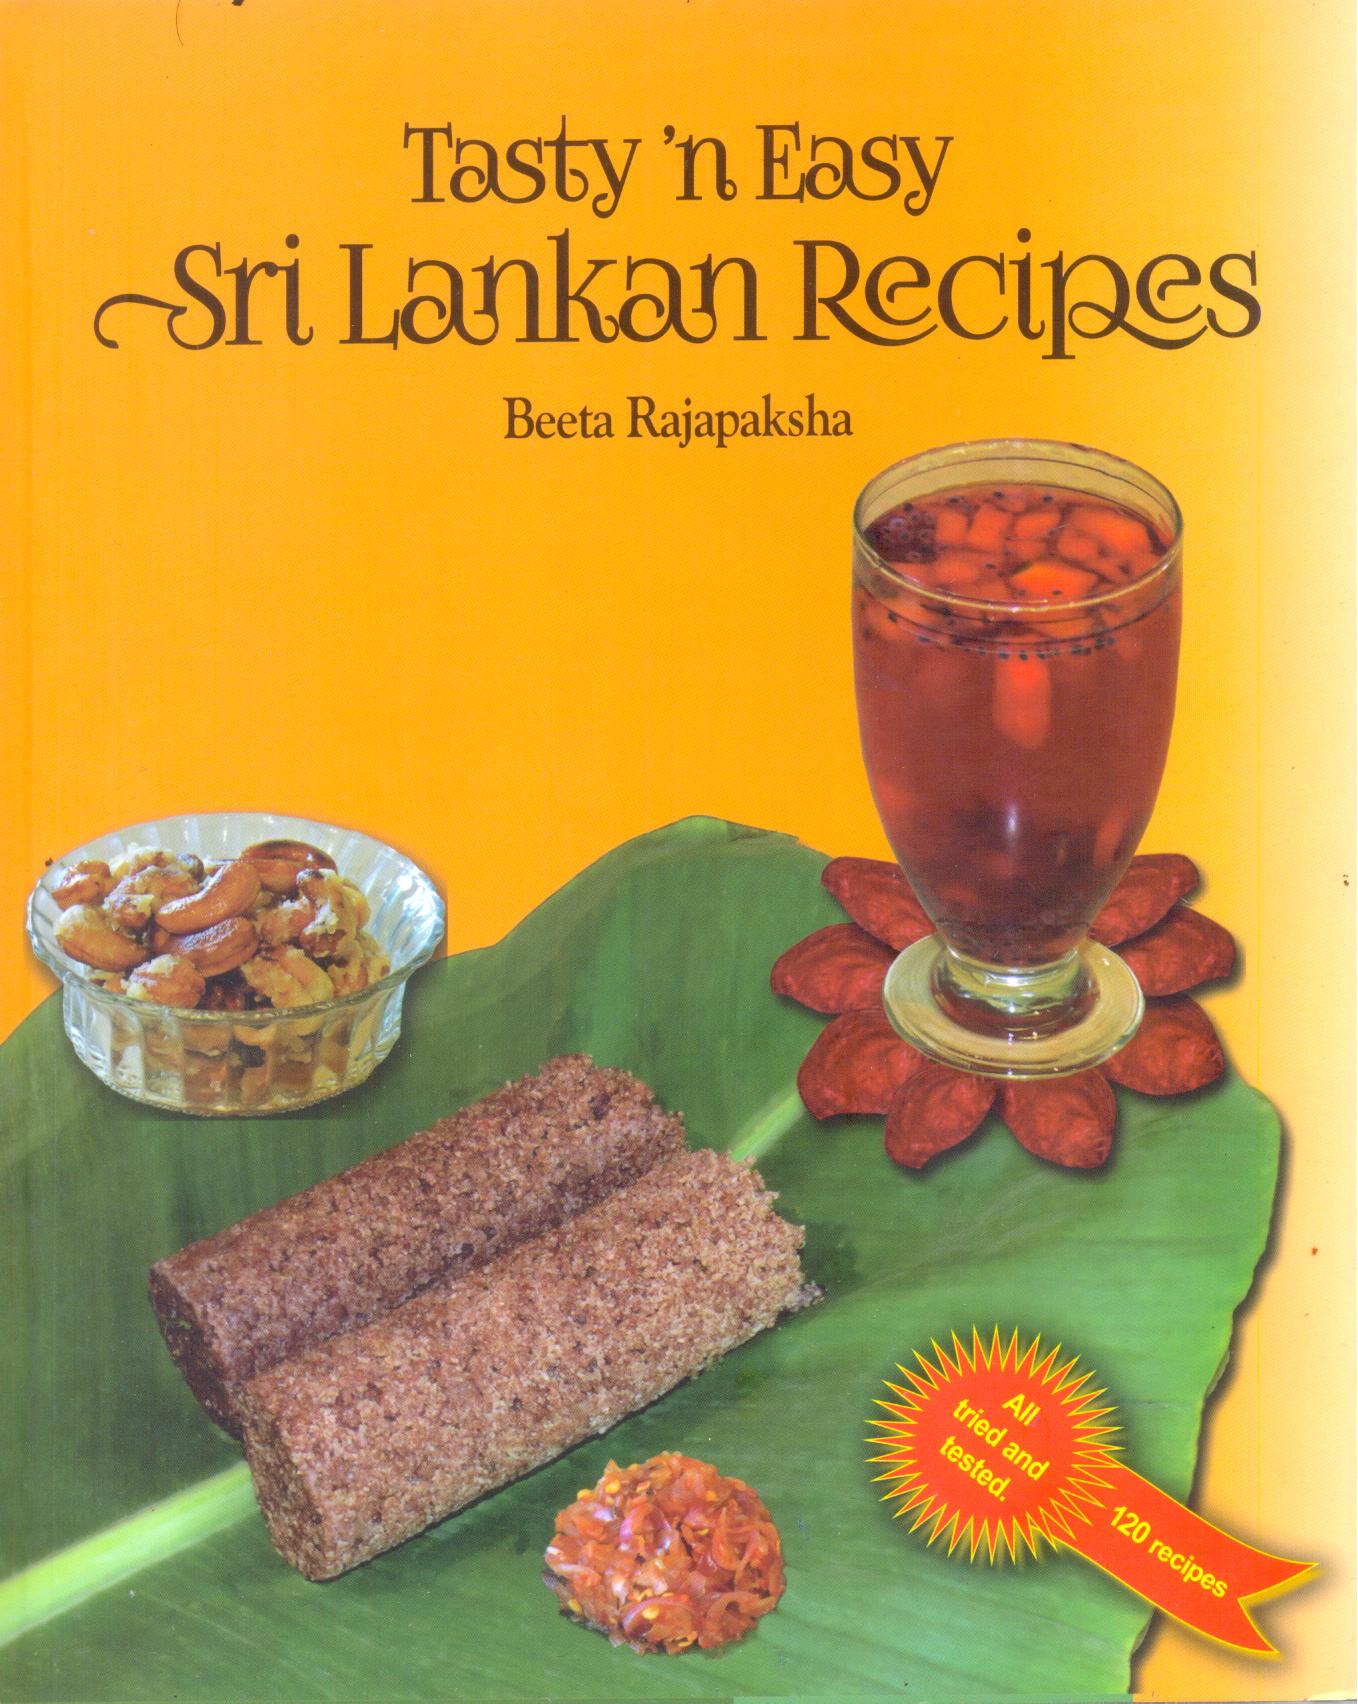 Taste 'n Easy Sri Lankan Recipes